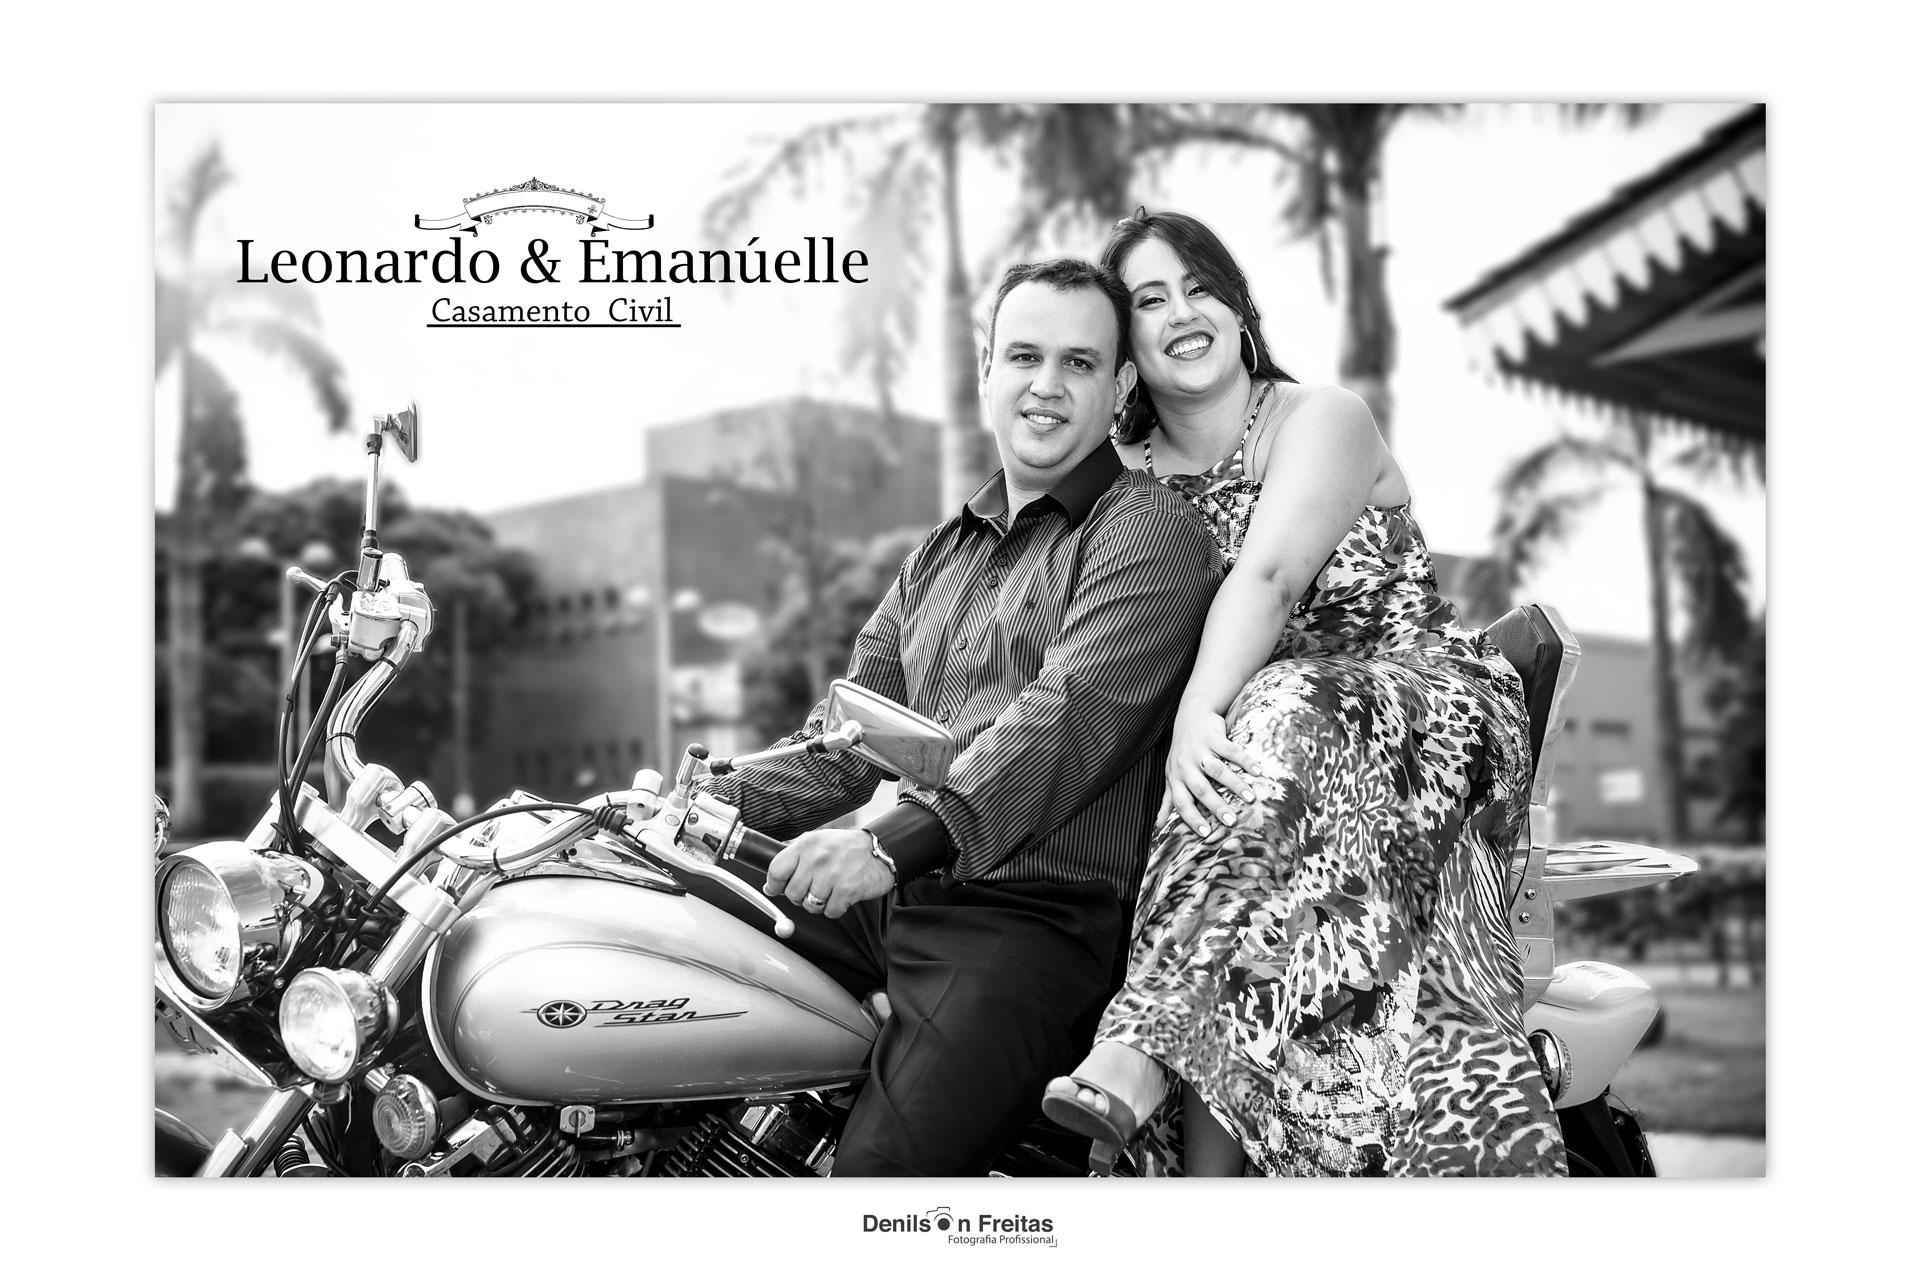 Enlace Civil - Emanuelle & Leonardo